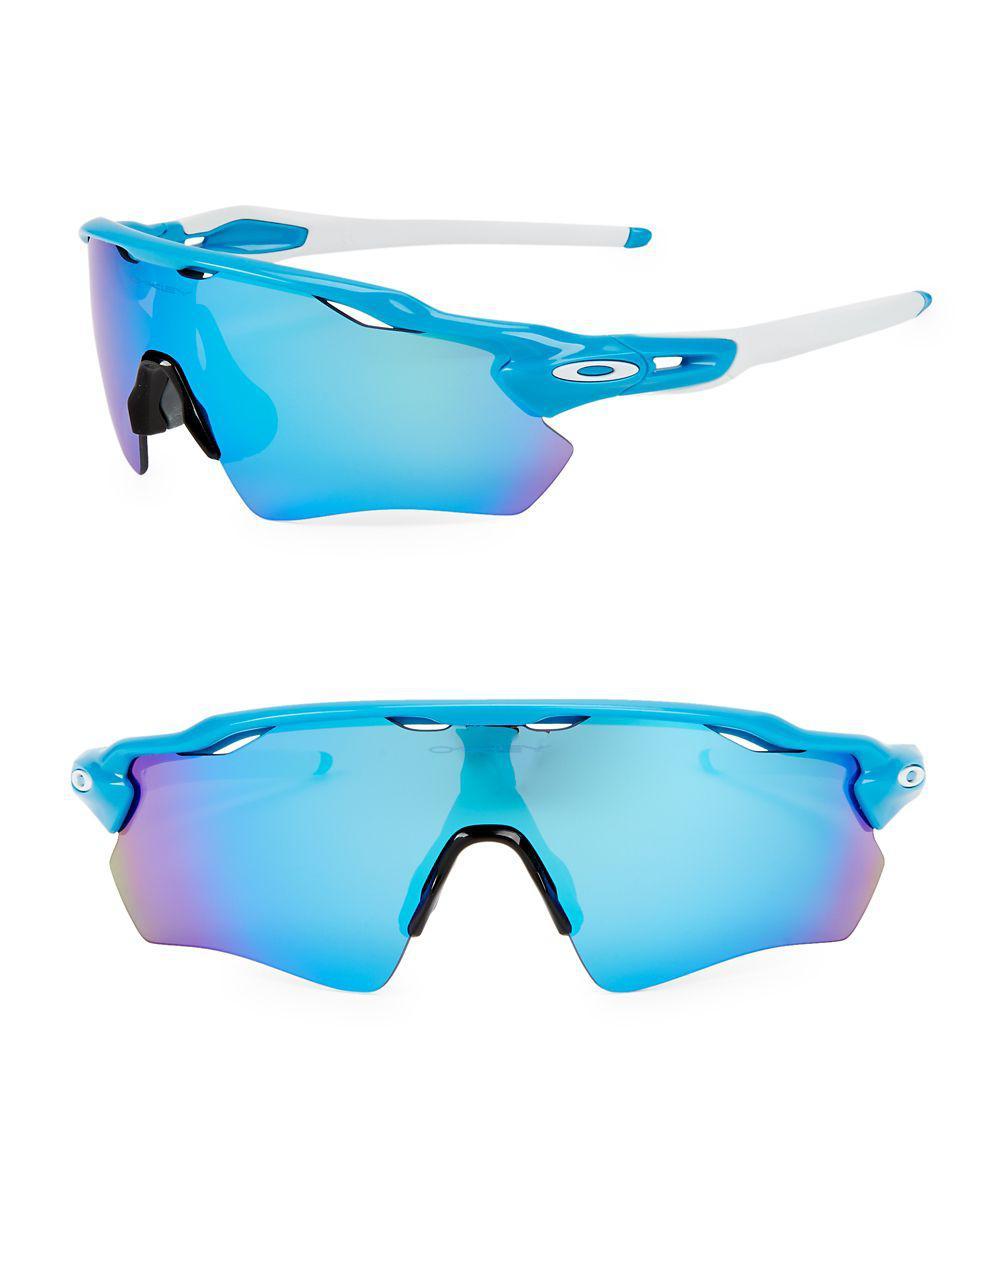 5c459a59b5 Lyst - Oakley 38mm Foldable Sunglasses in Blue for Men